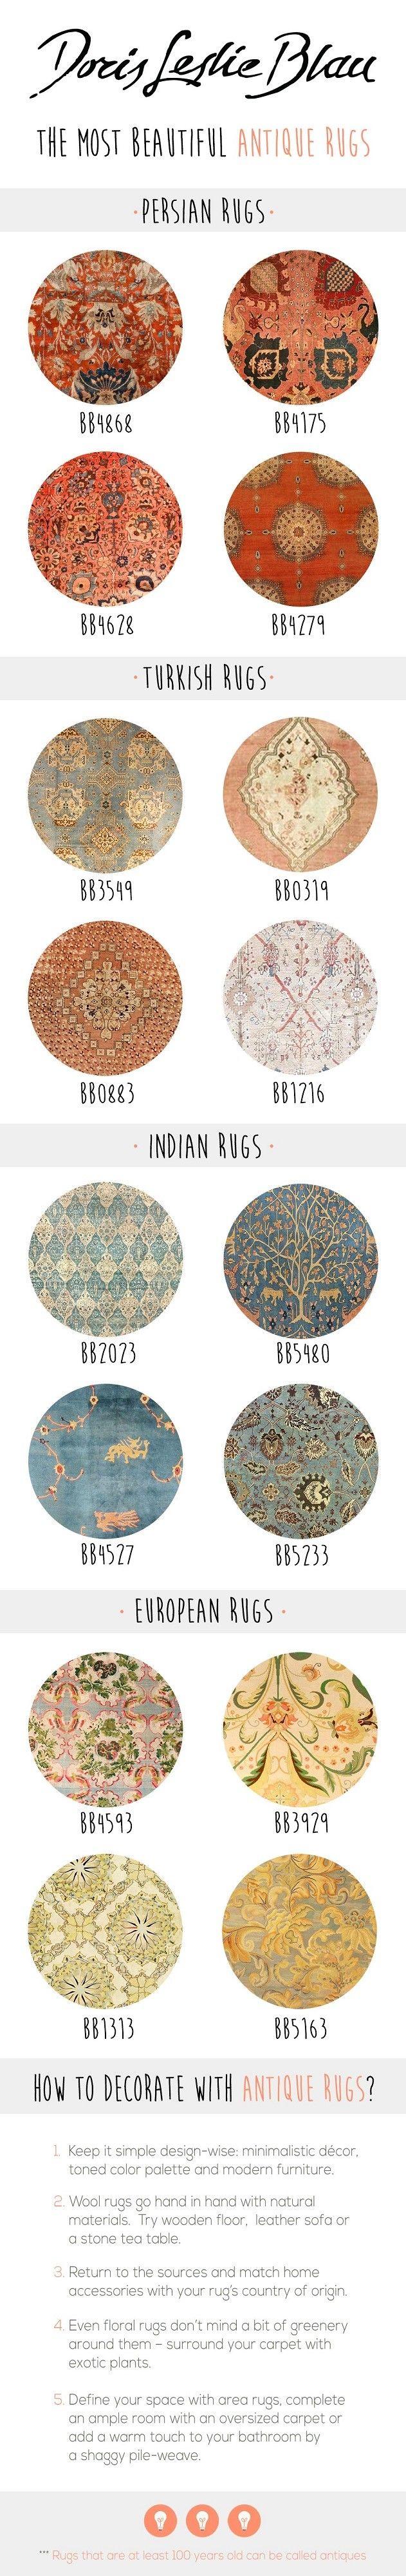 * Antique rug interior decor * Modern interior decor, modern living room with antique rugs! #interior